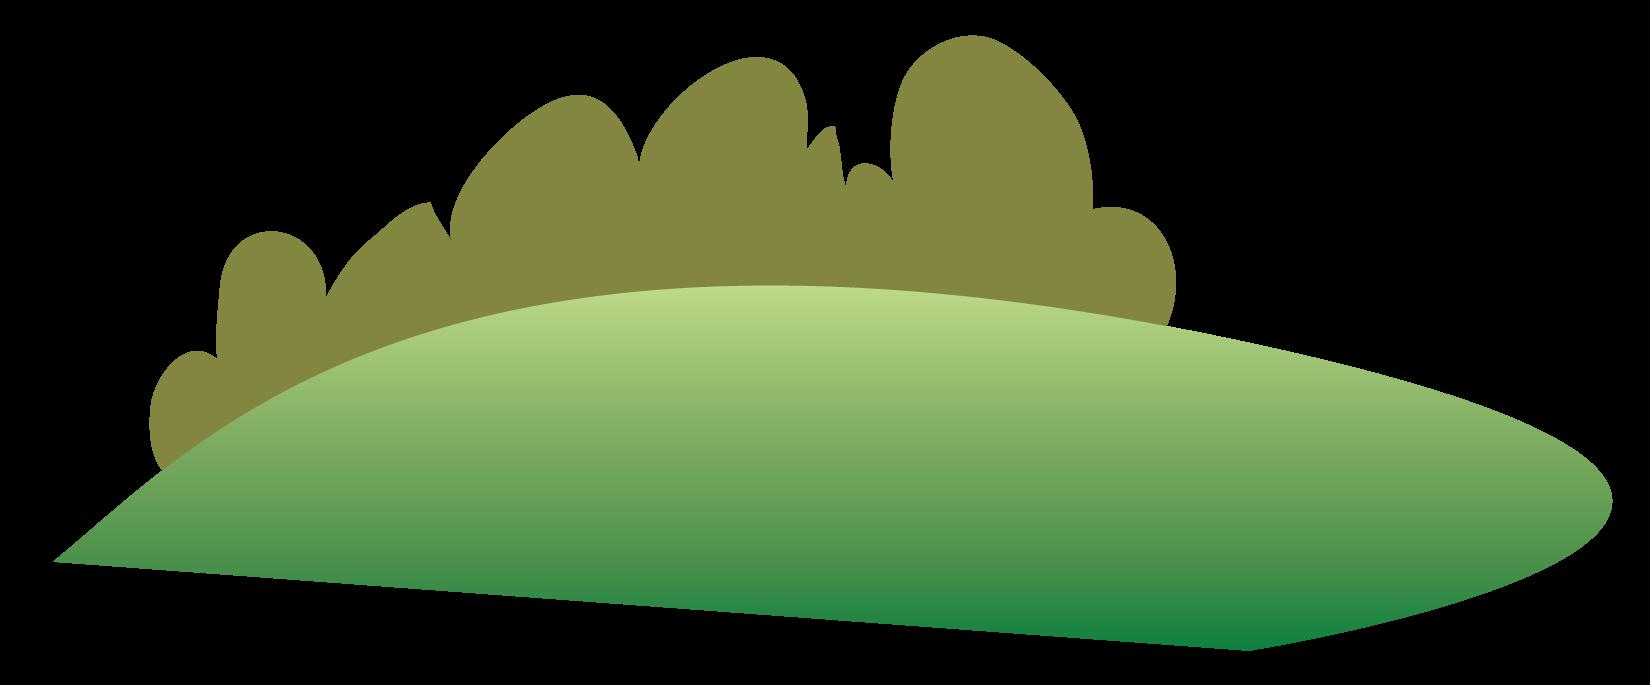 Hills clipart distant. Svg frames illustrations hd